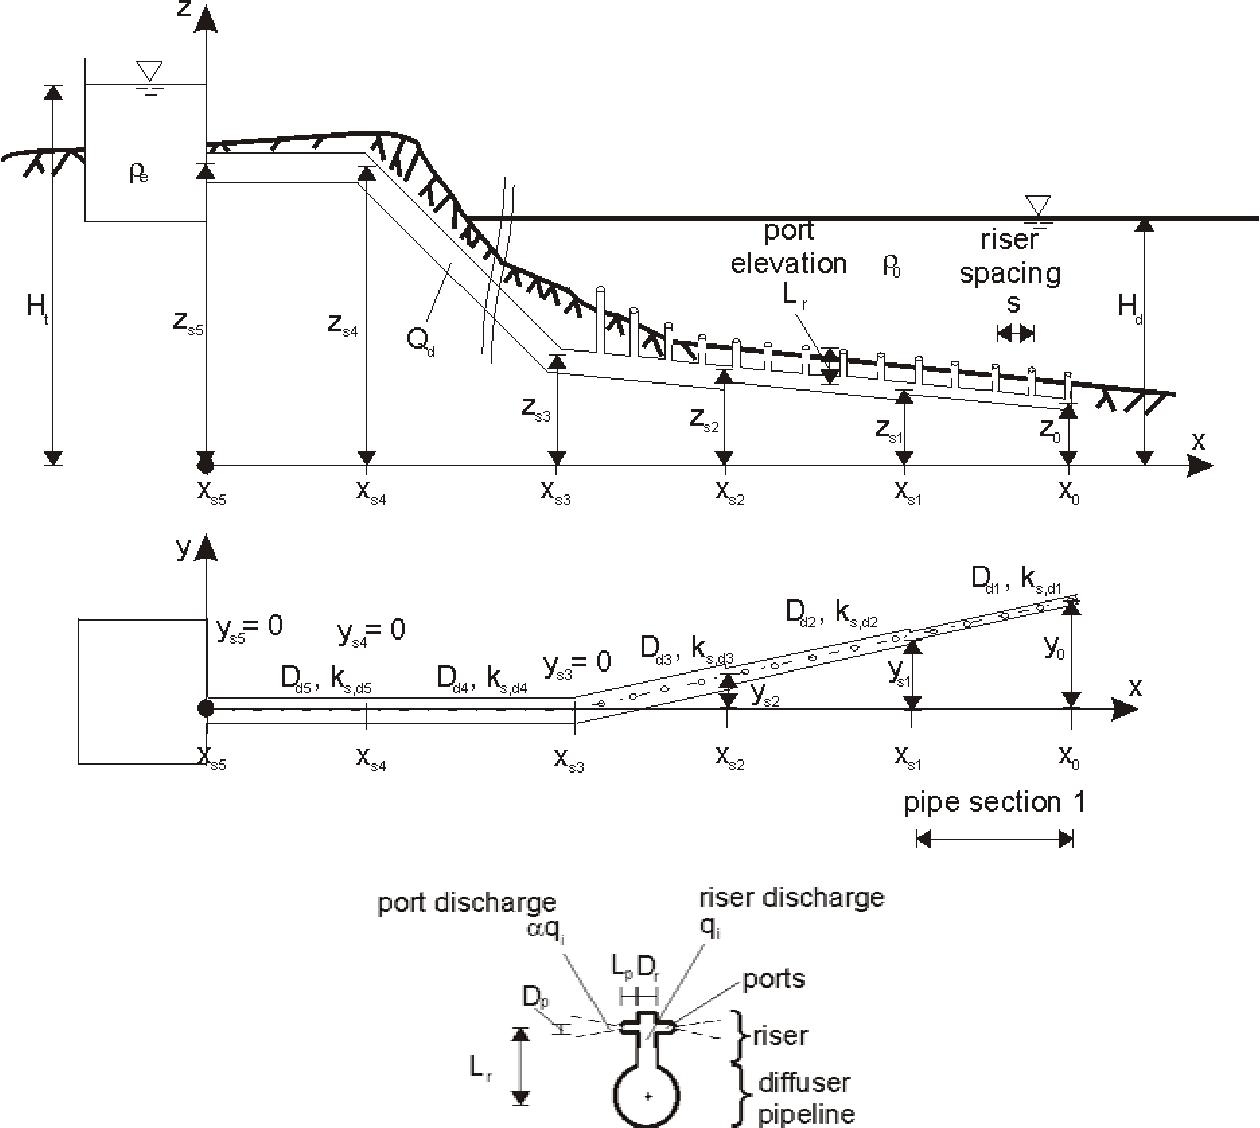 Figure 15 from USER'S MANUA AN INTERNA HYDRAUL - Semantic ... on